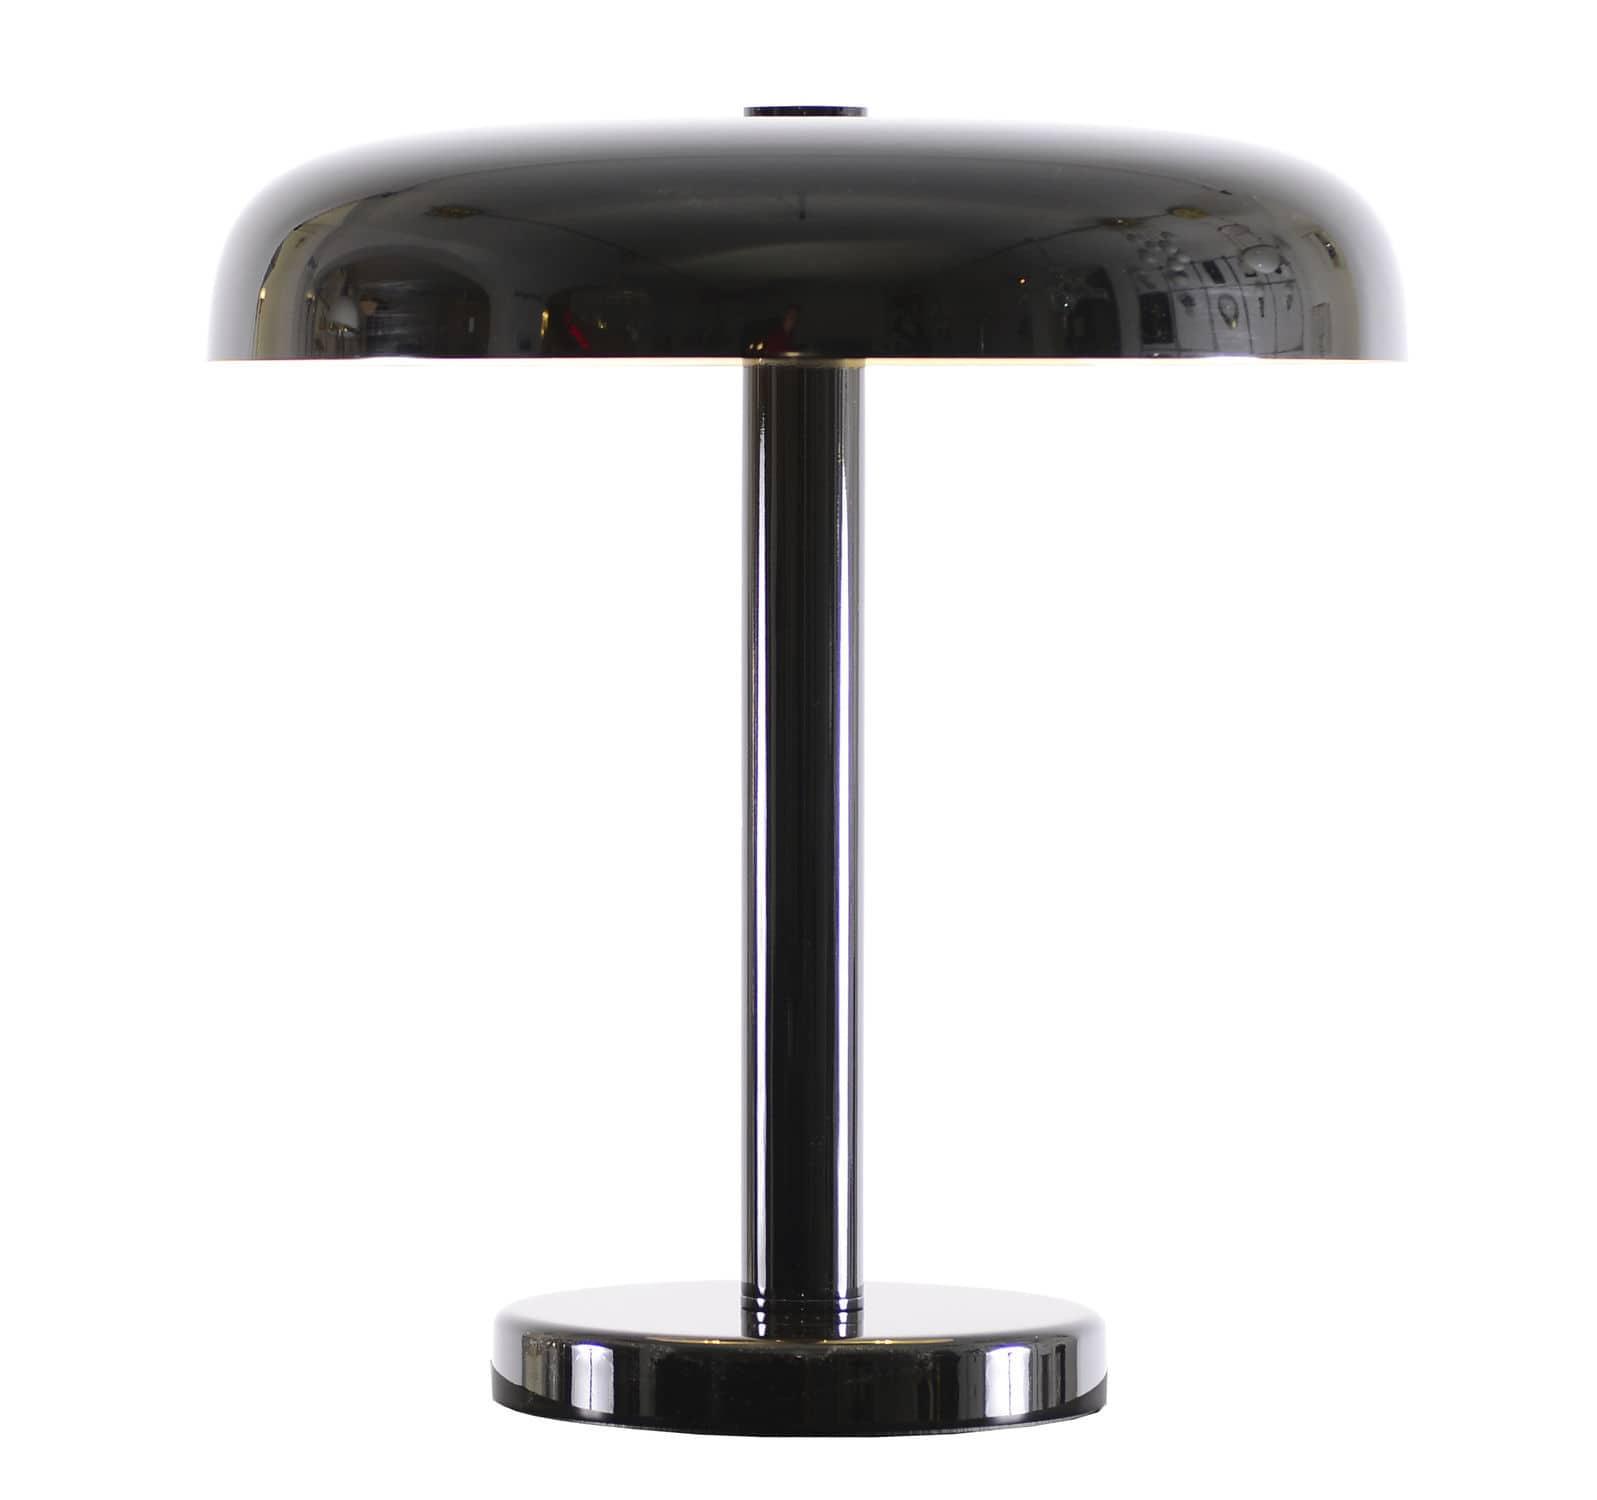 Table lamp / Bauhaus design / brass / silver - AD1 51 - Woka Lamps ...